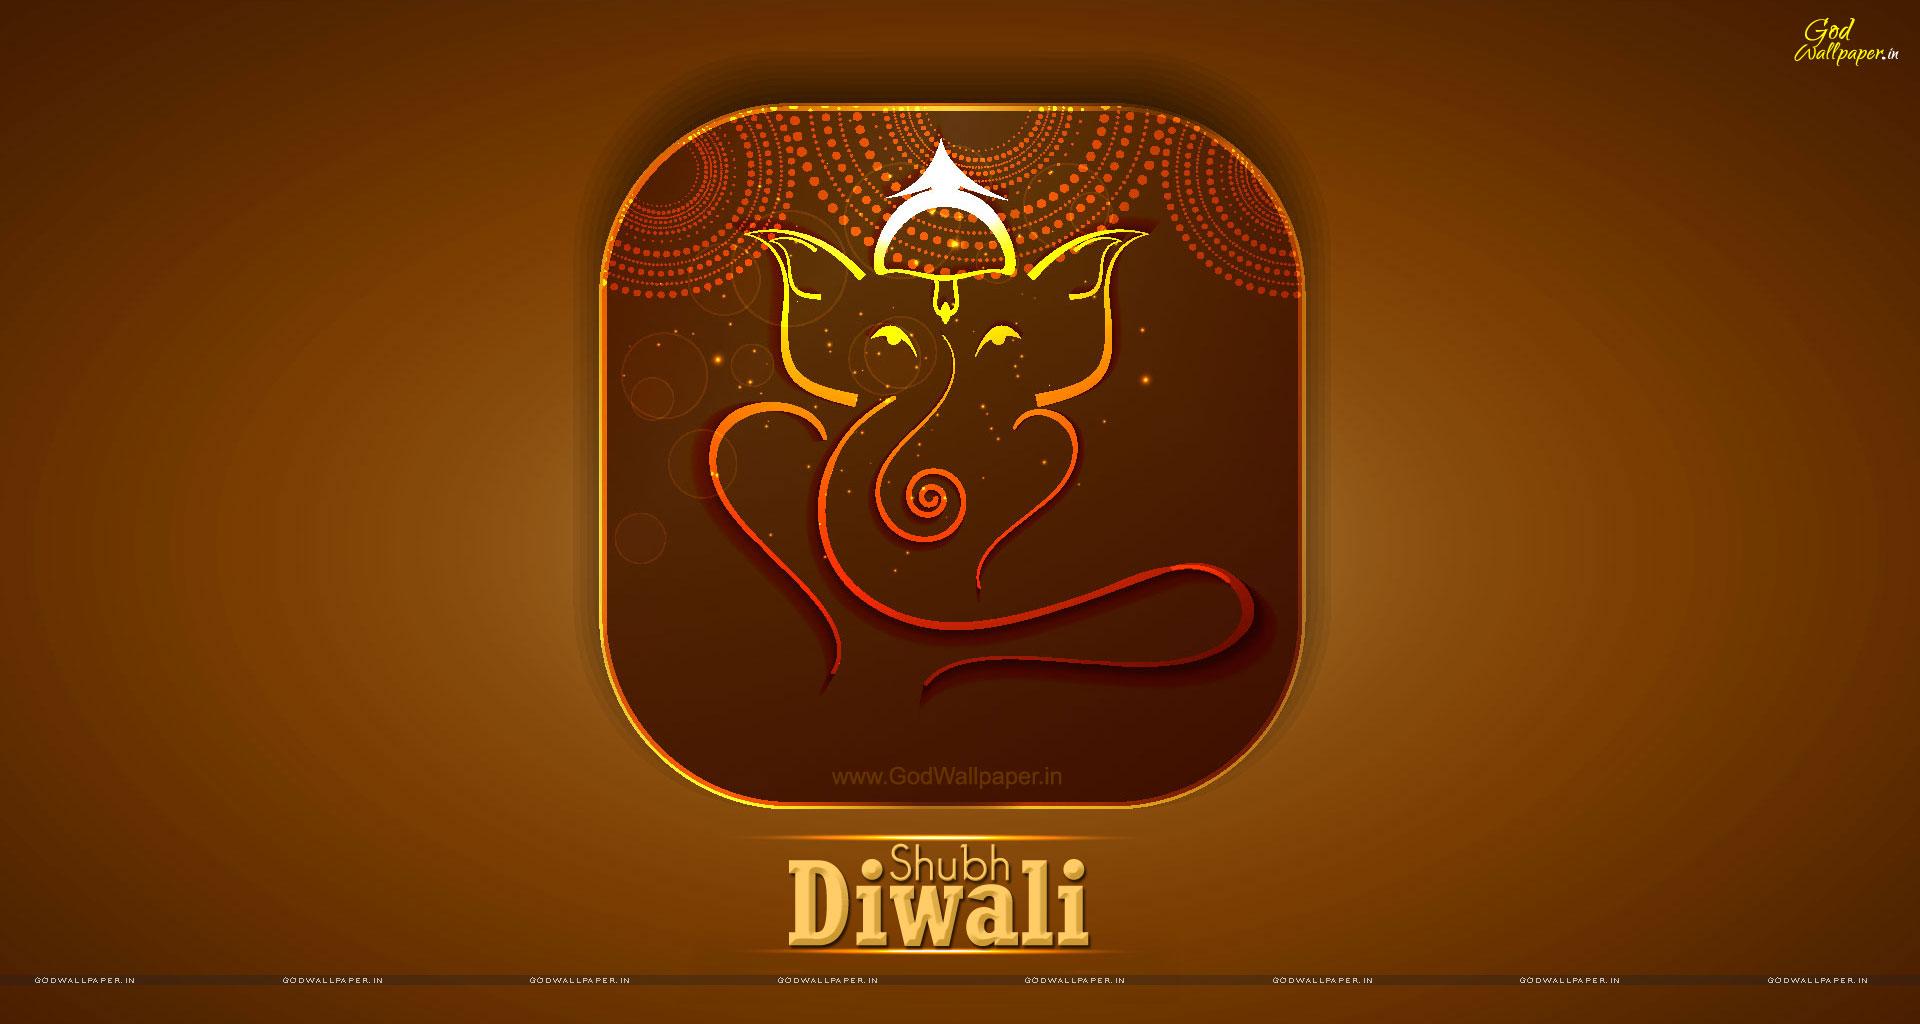 Diwali Wallpaper 1080p Full Hd Widescreen For Desktop